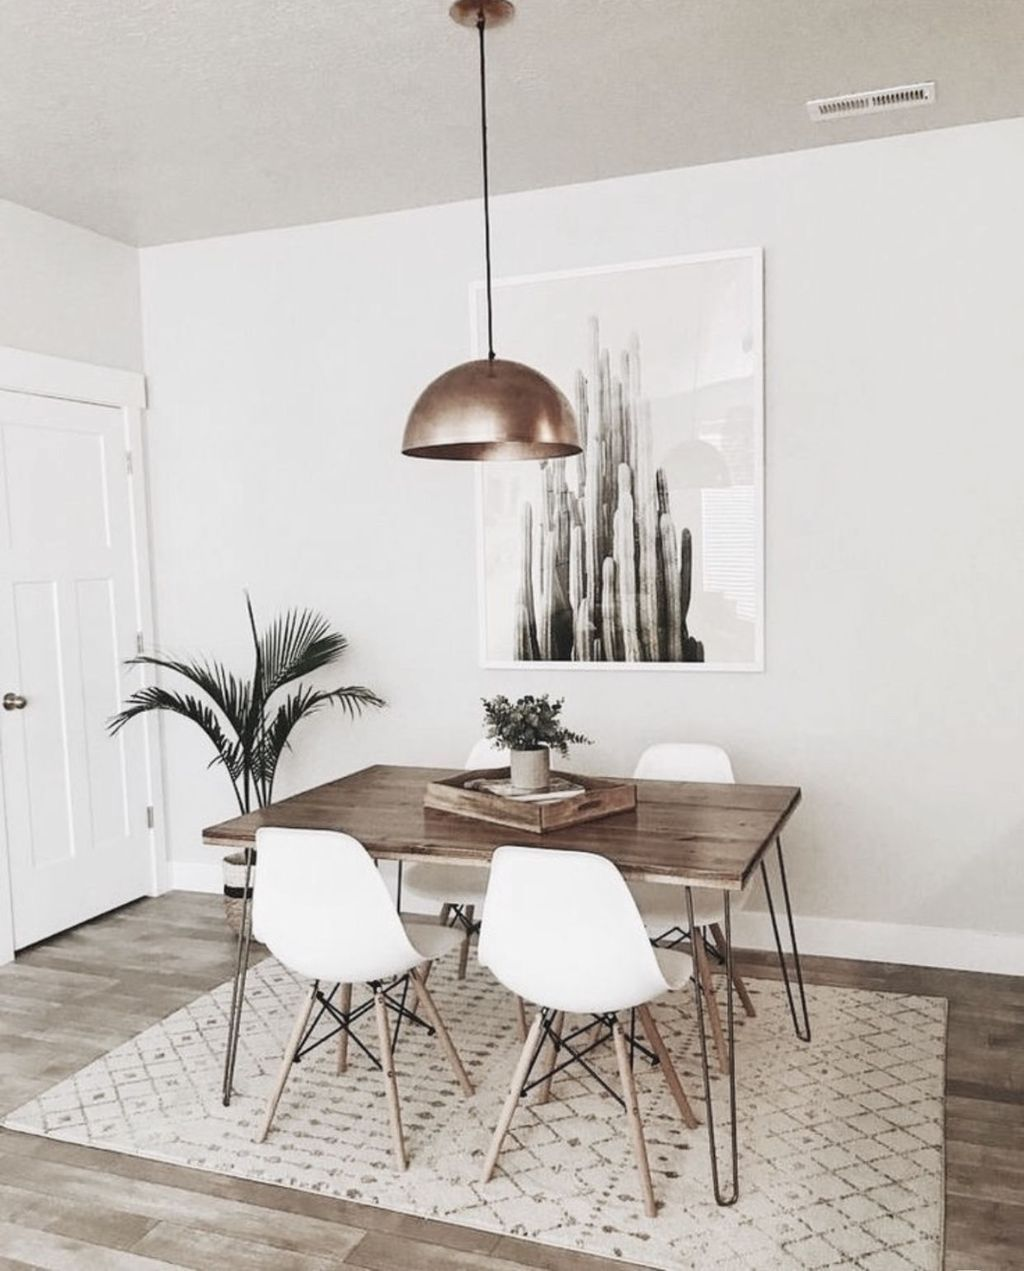 48 Stunning Small Dining Room Design Ideas Minimalist Dining